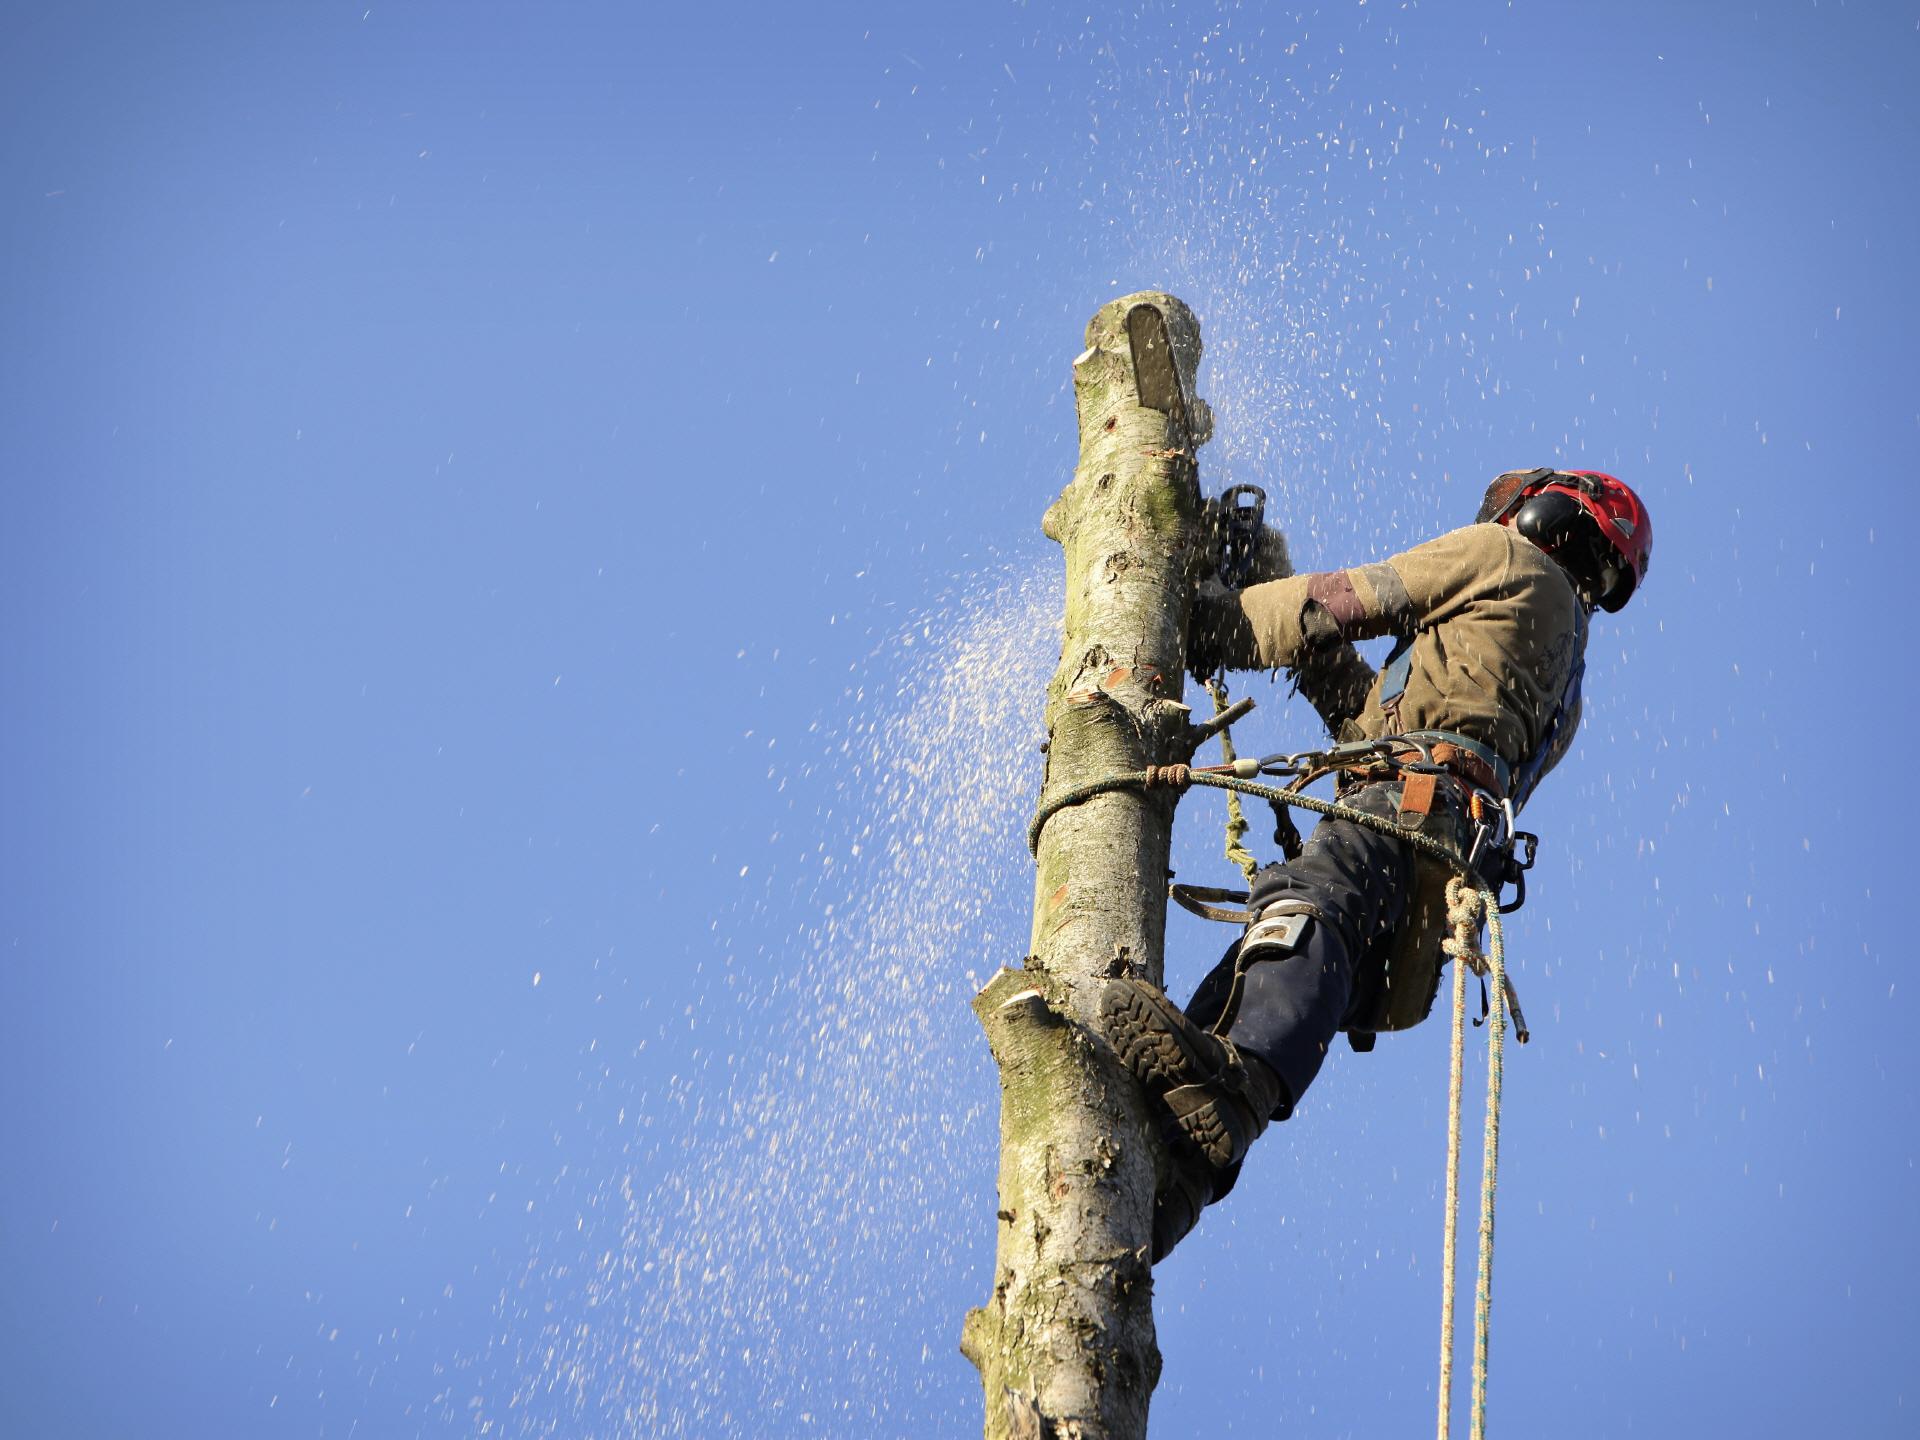 Baumpflege Klettergurt : Baumpflege sebastian körber baumfällung objektpflege